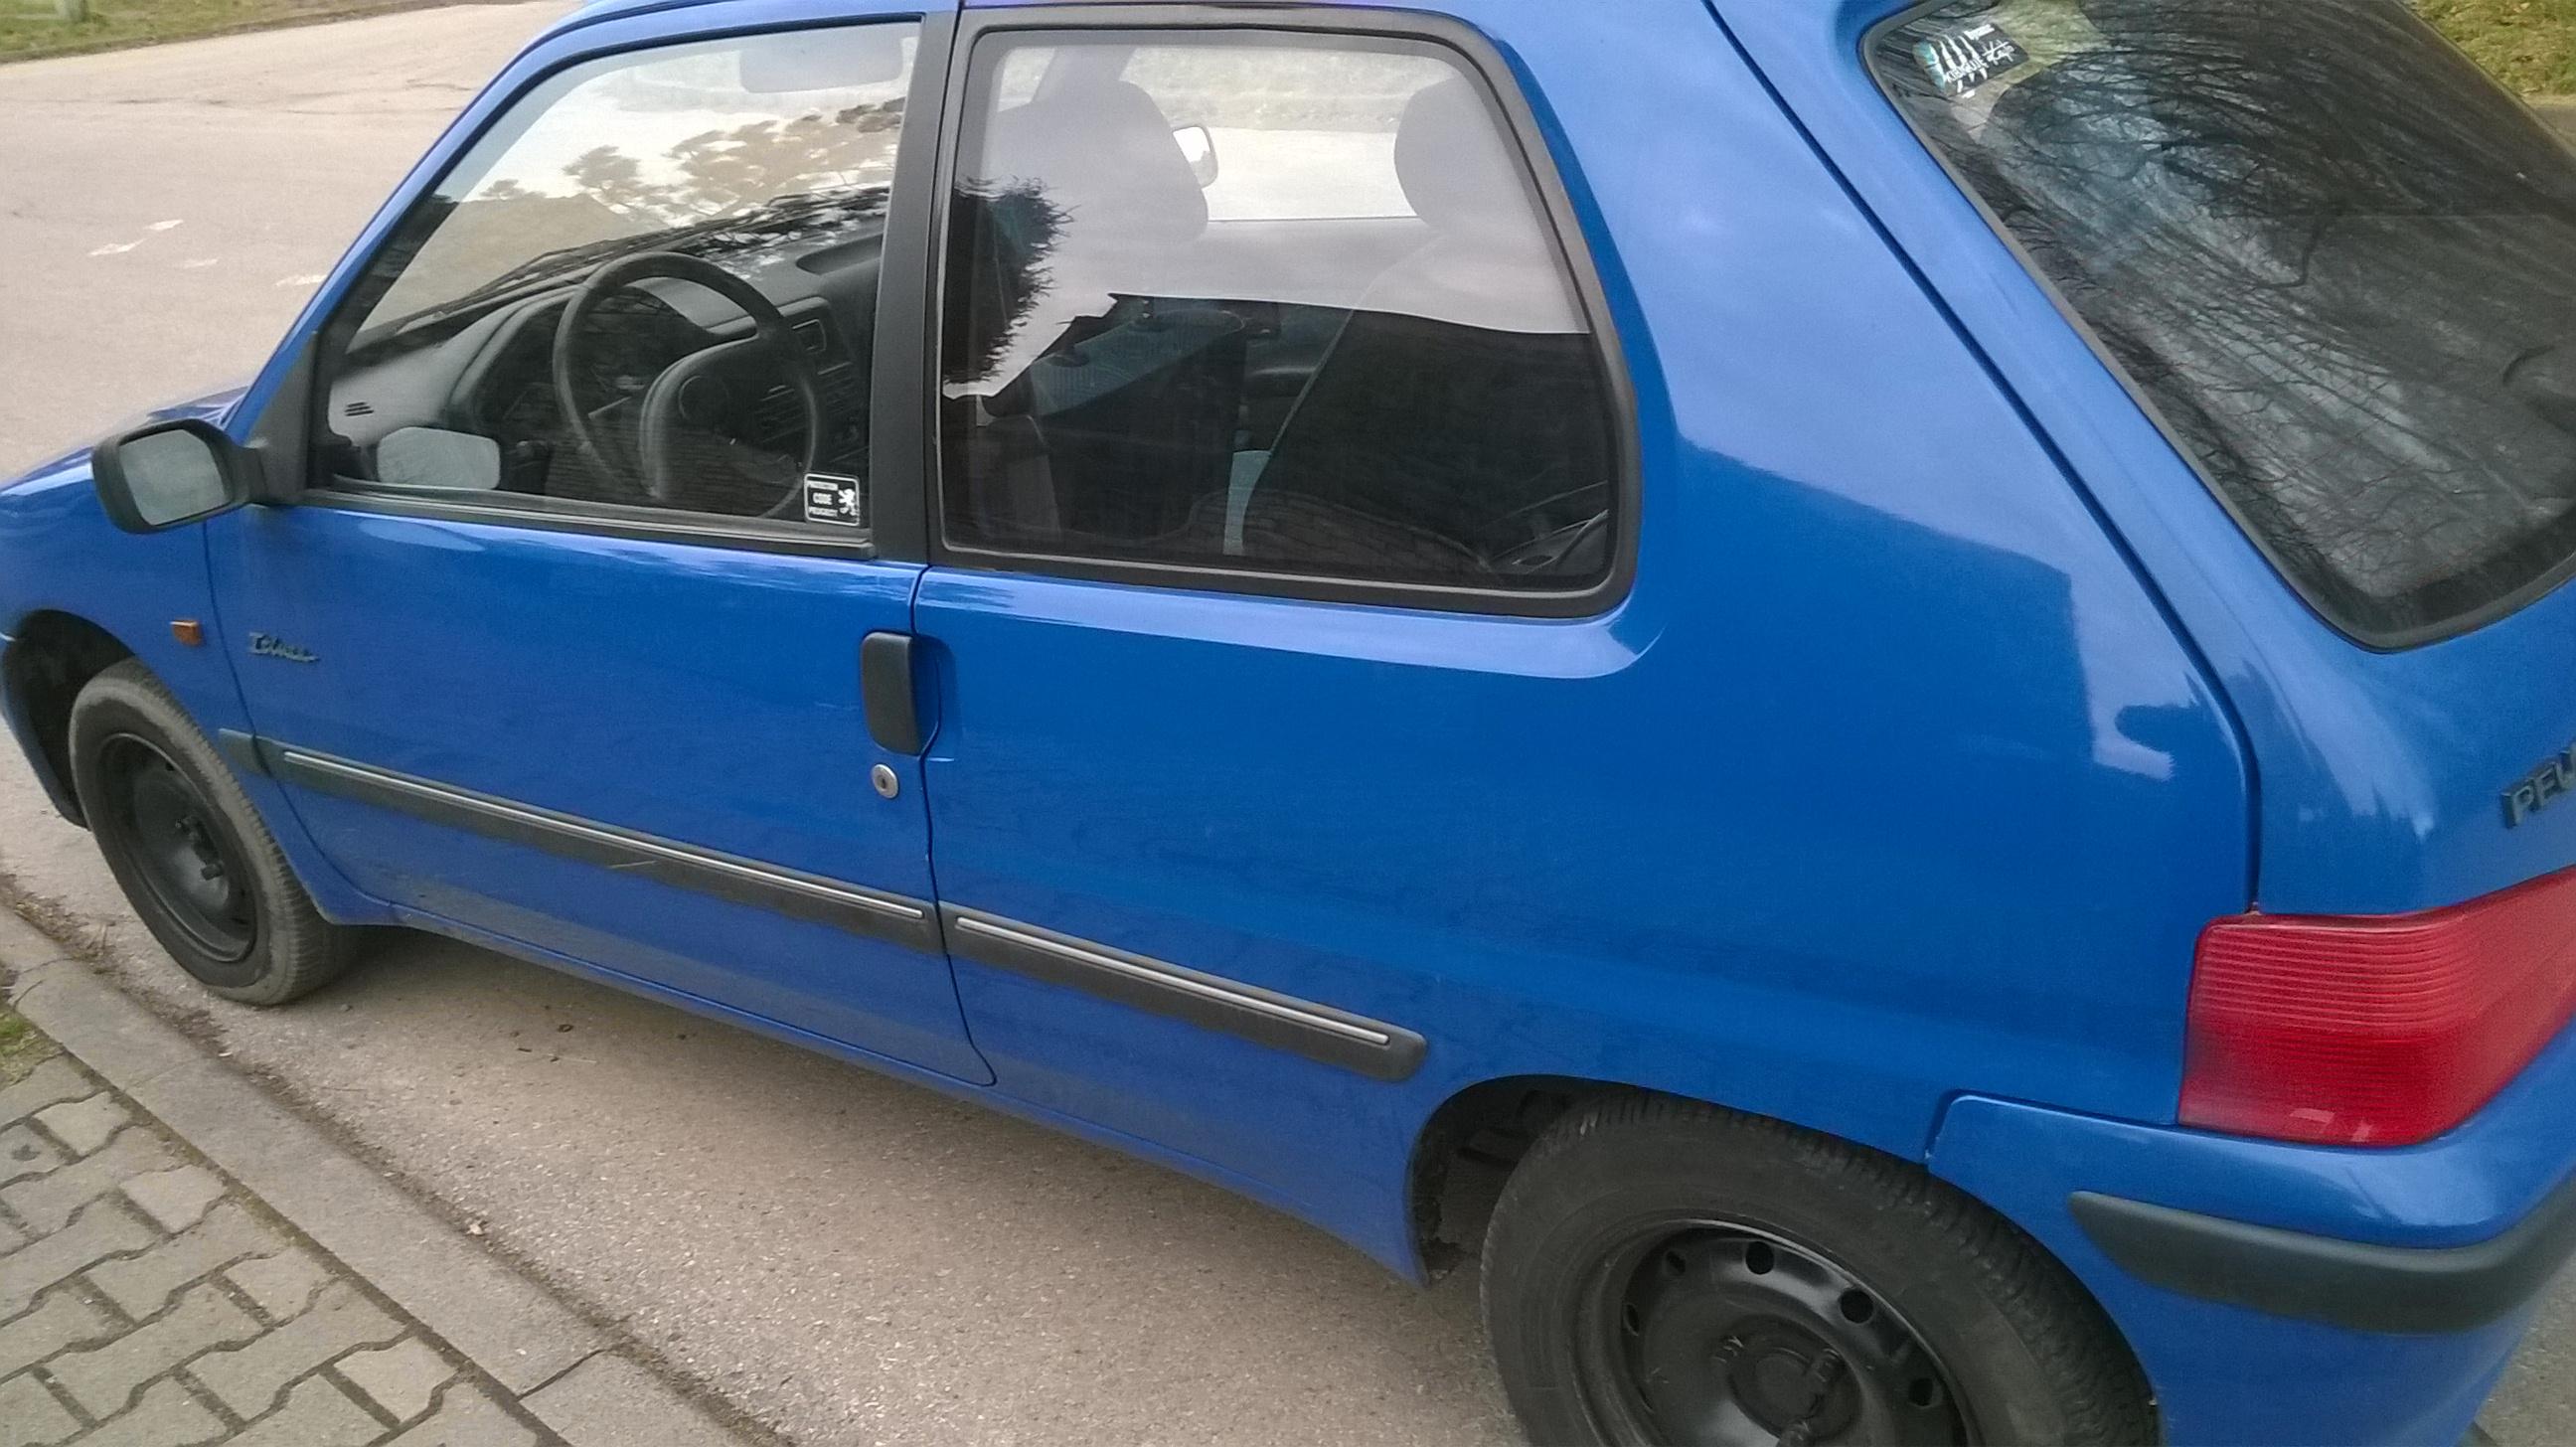 Sprzedam Peugeot 106. Polecam